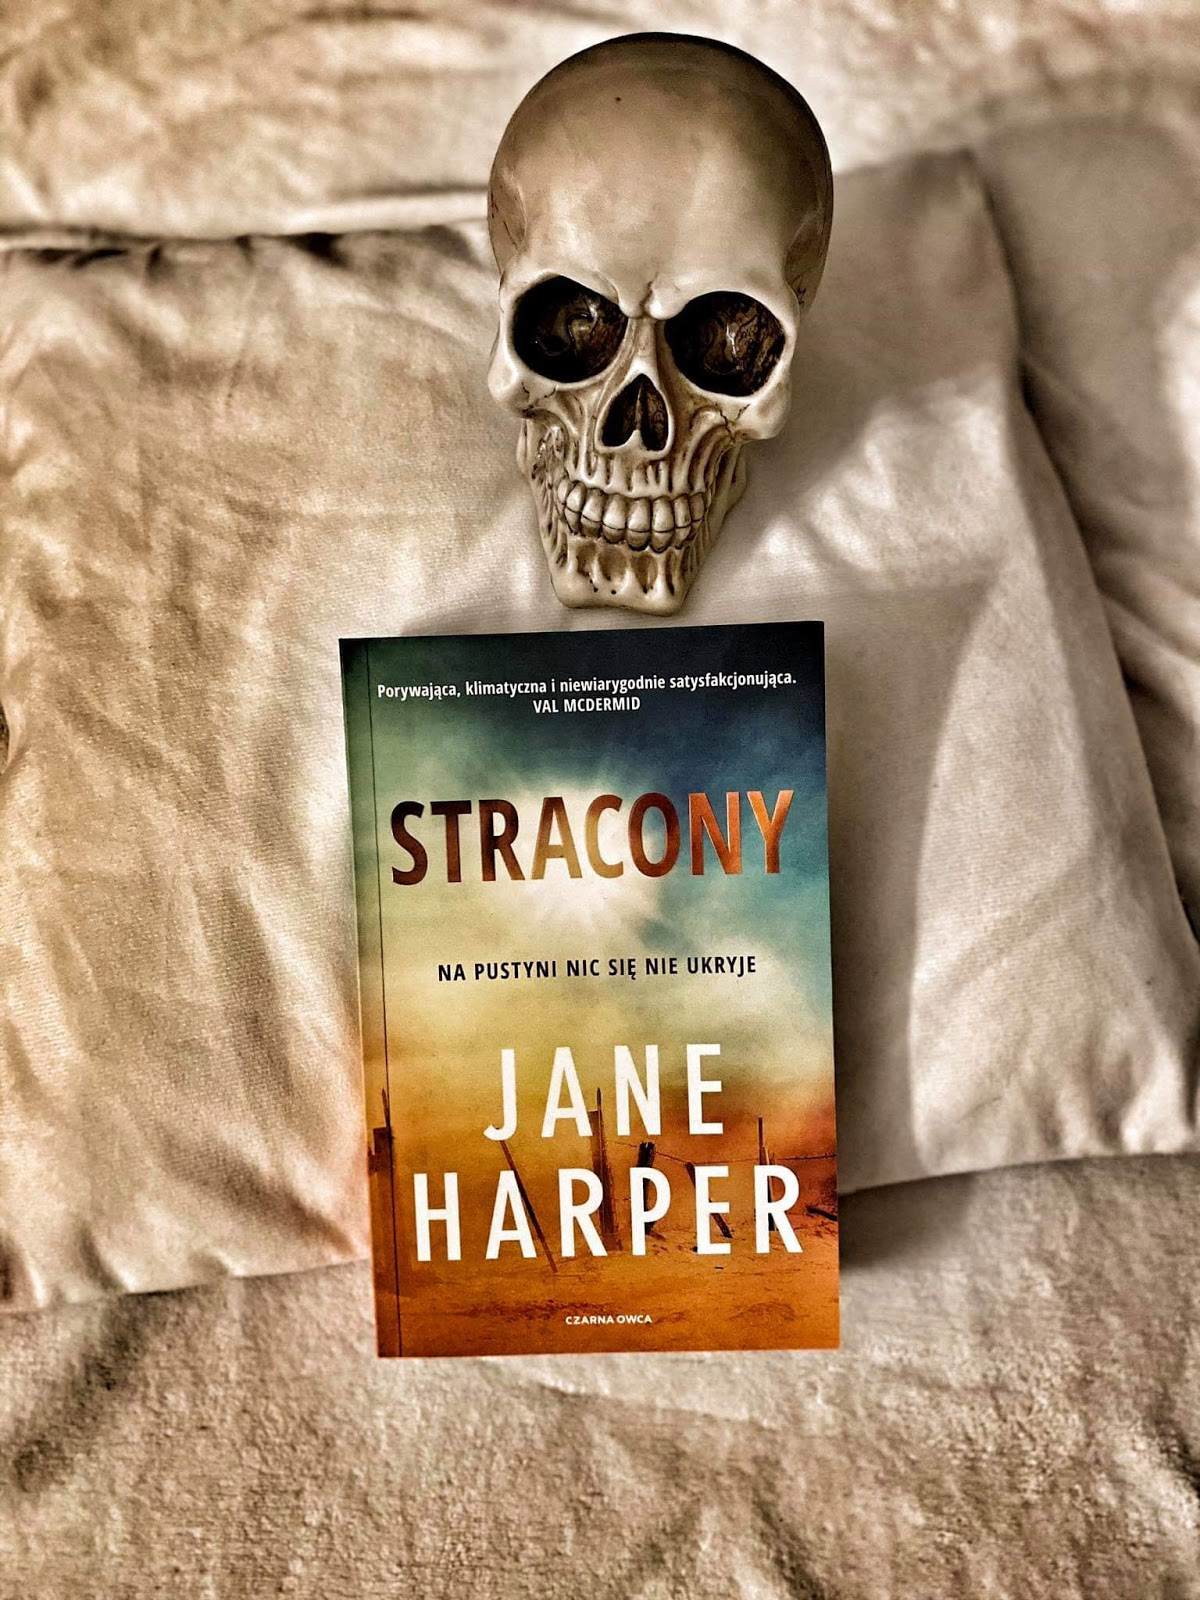 Jane Harper - Stracony